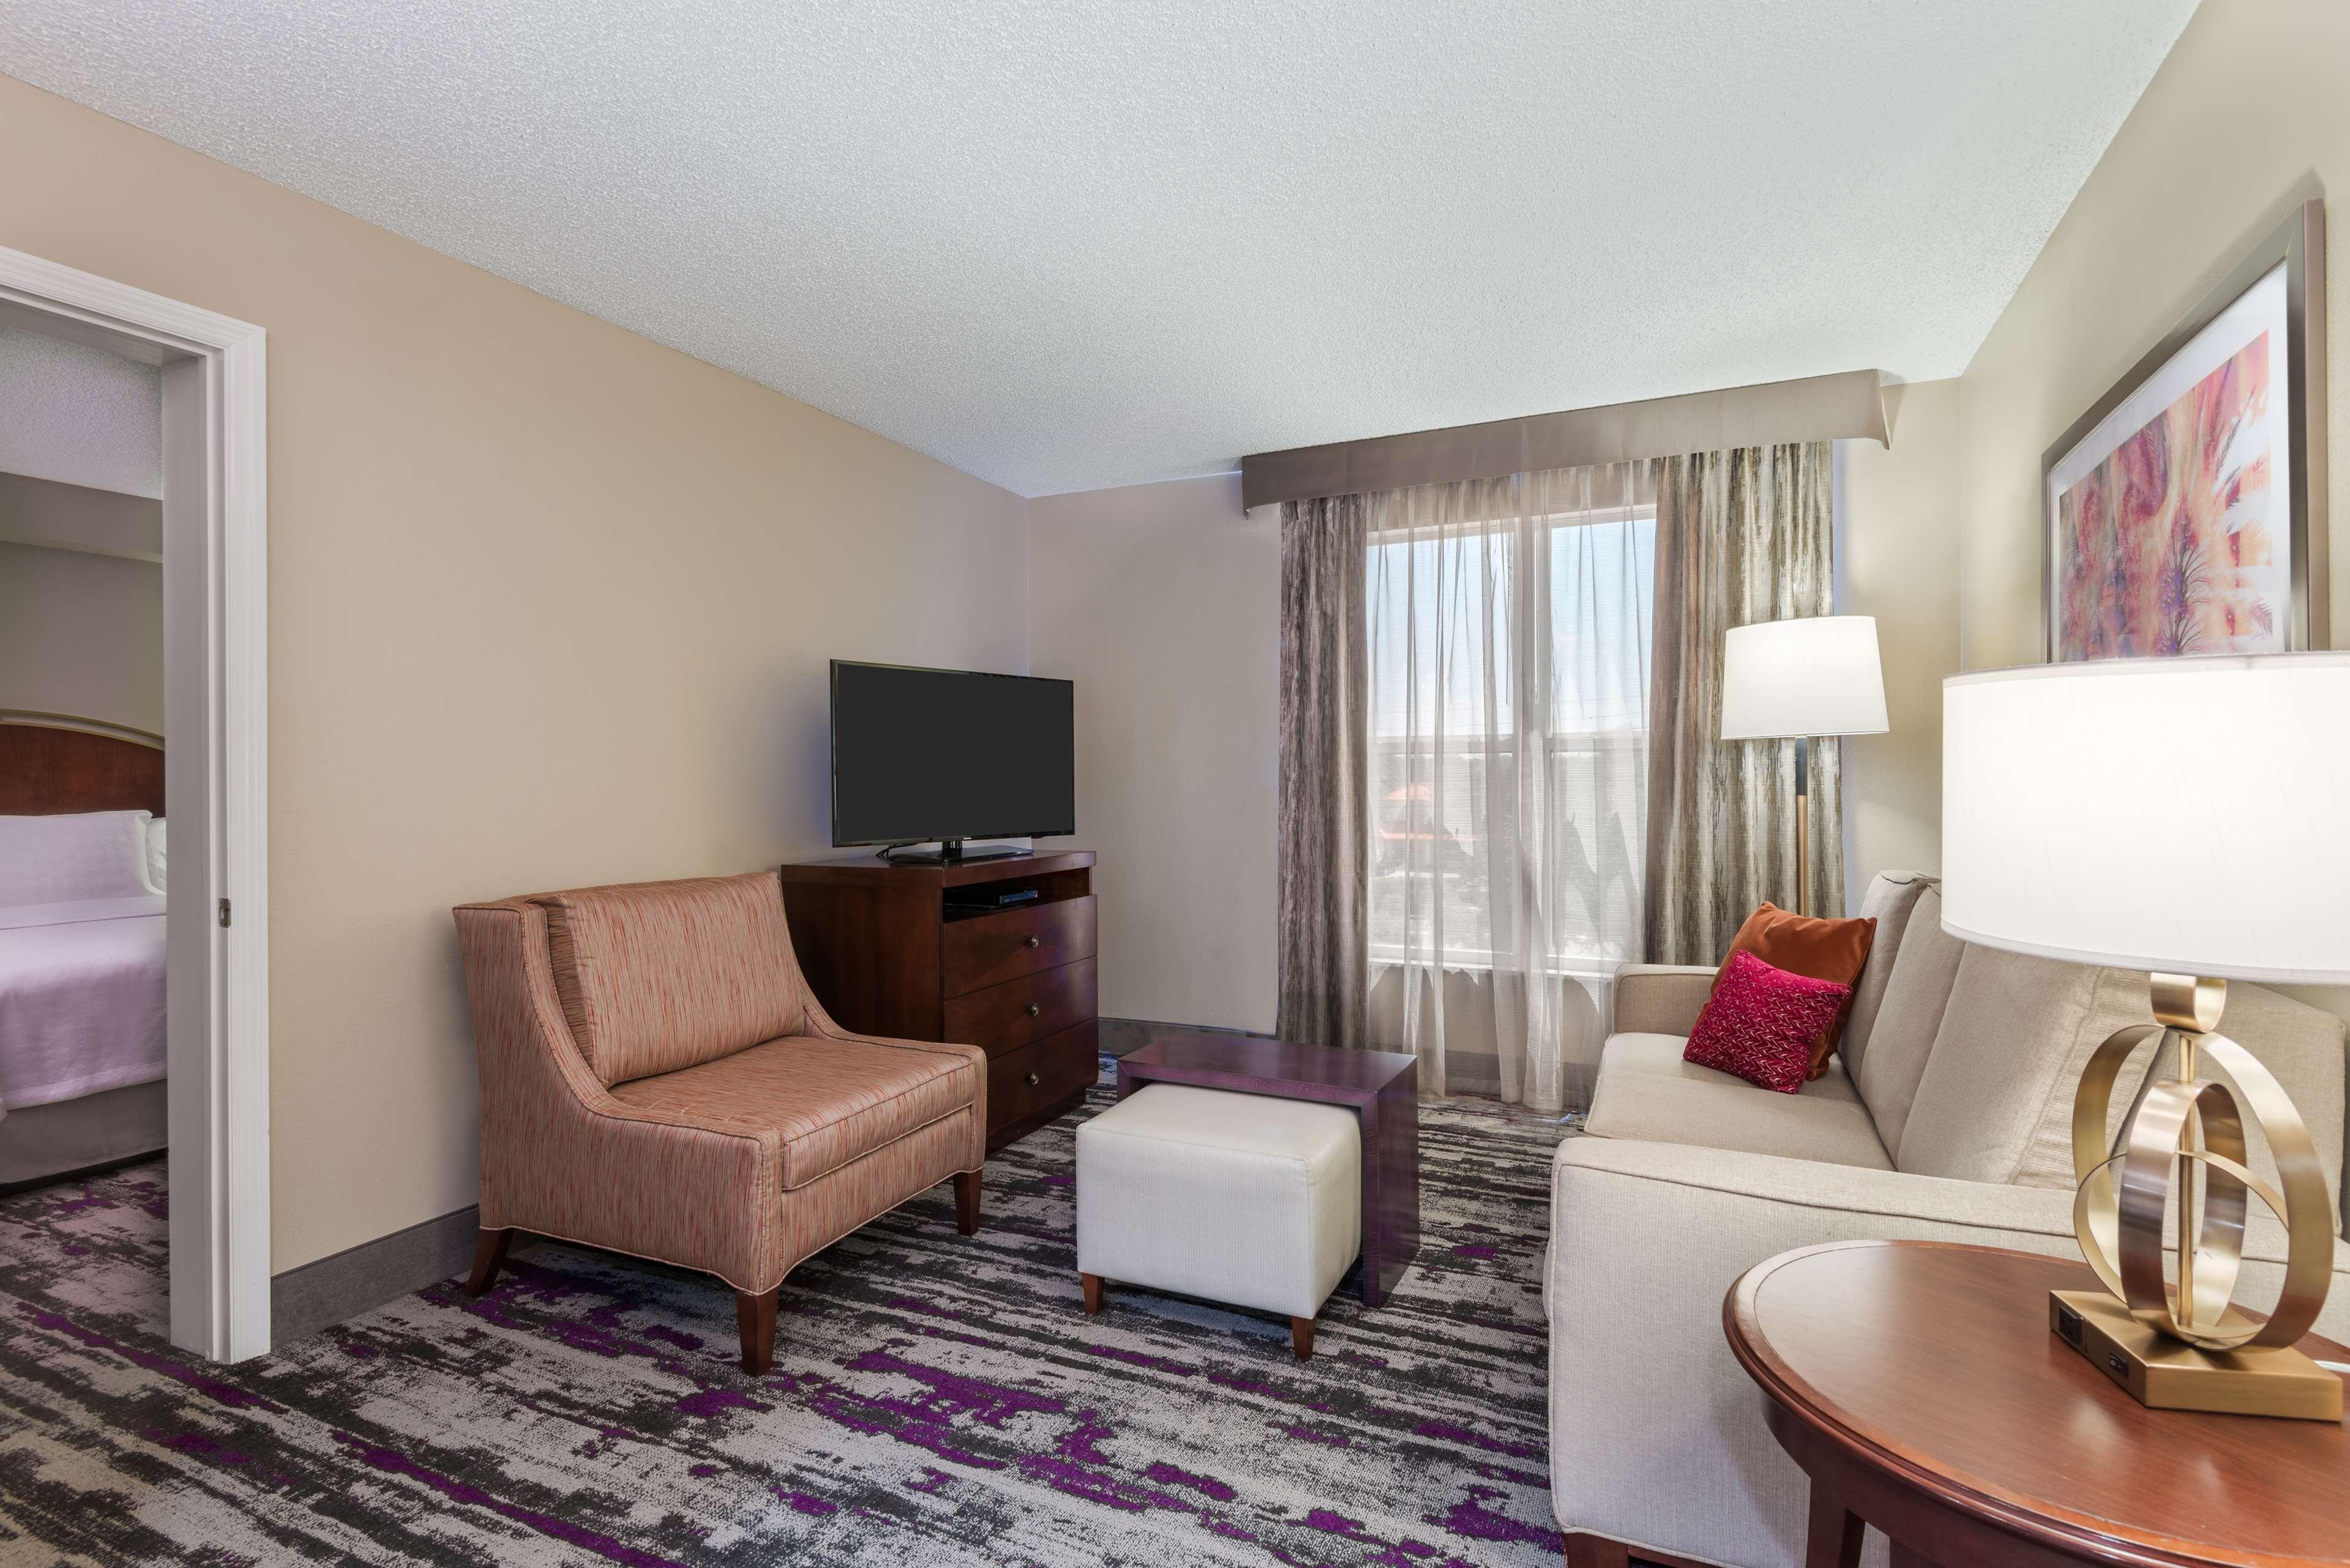 Homewood Suites by Hilton Orlando-UCF Area image 16